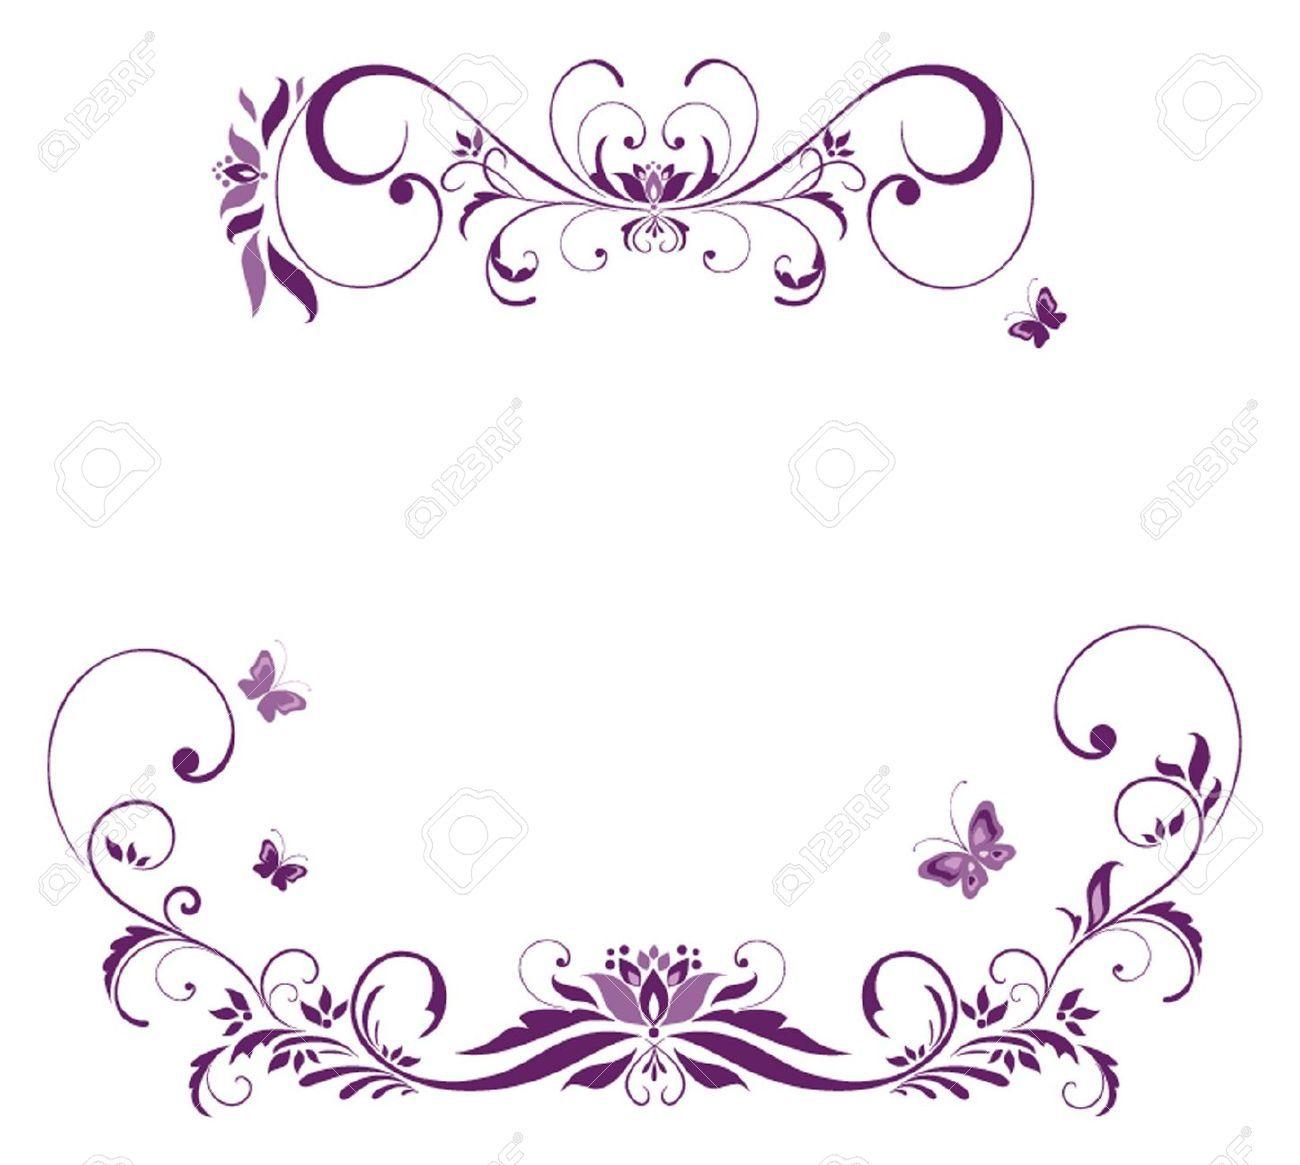 Stock Vector Flower sketches, Floral border, Floral